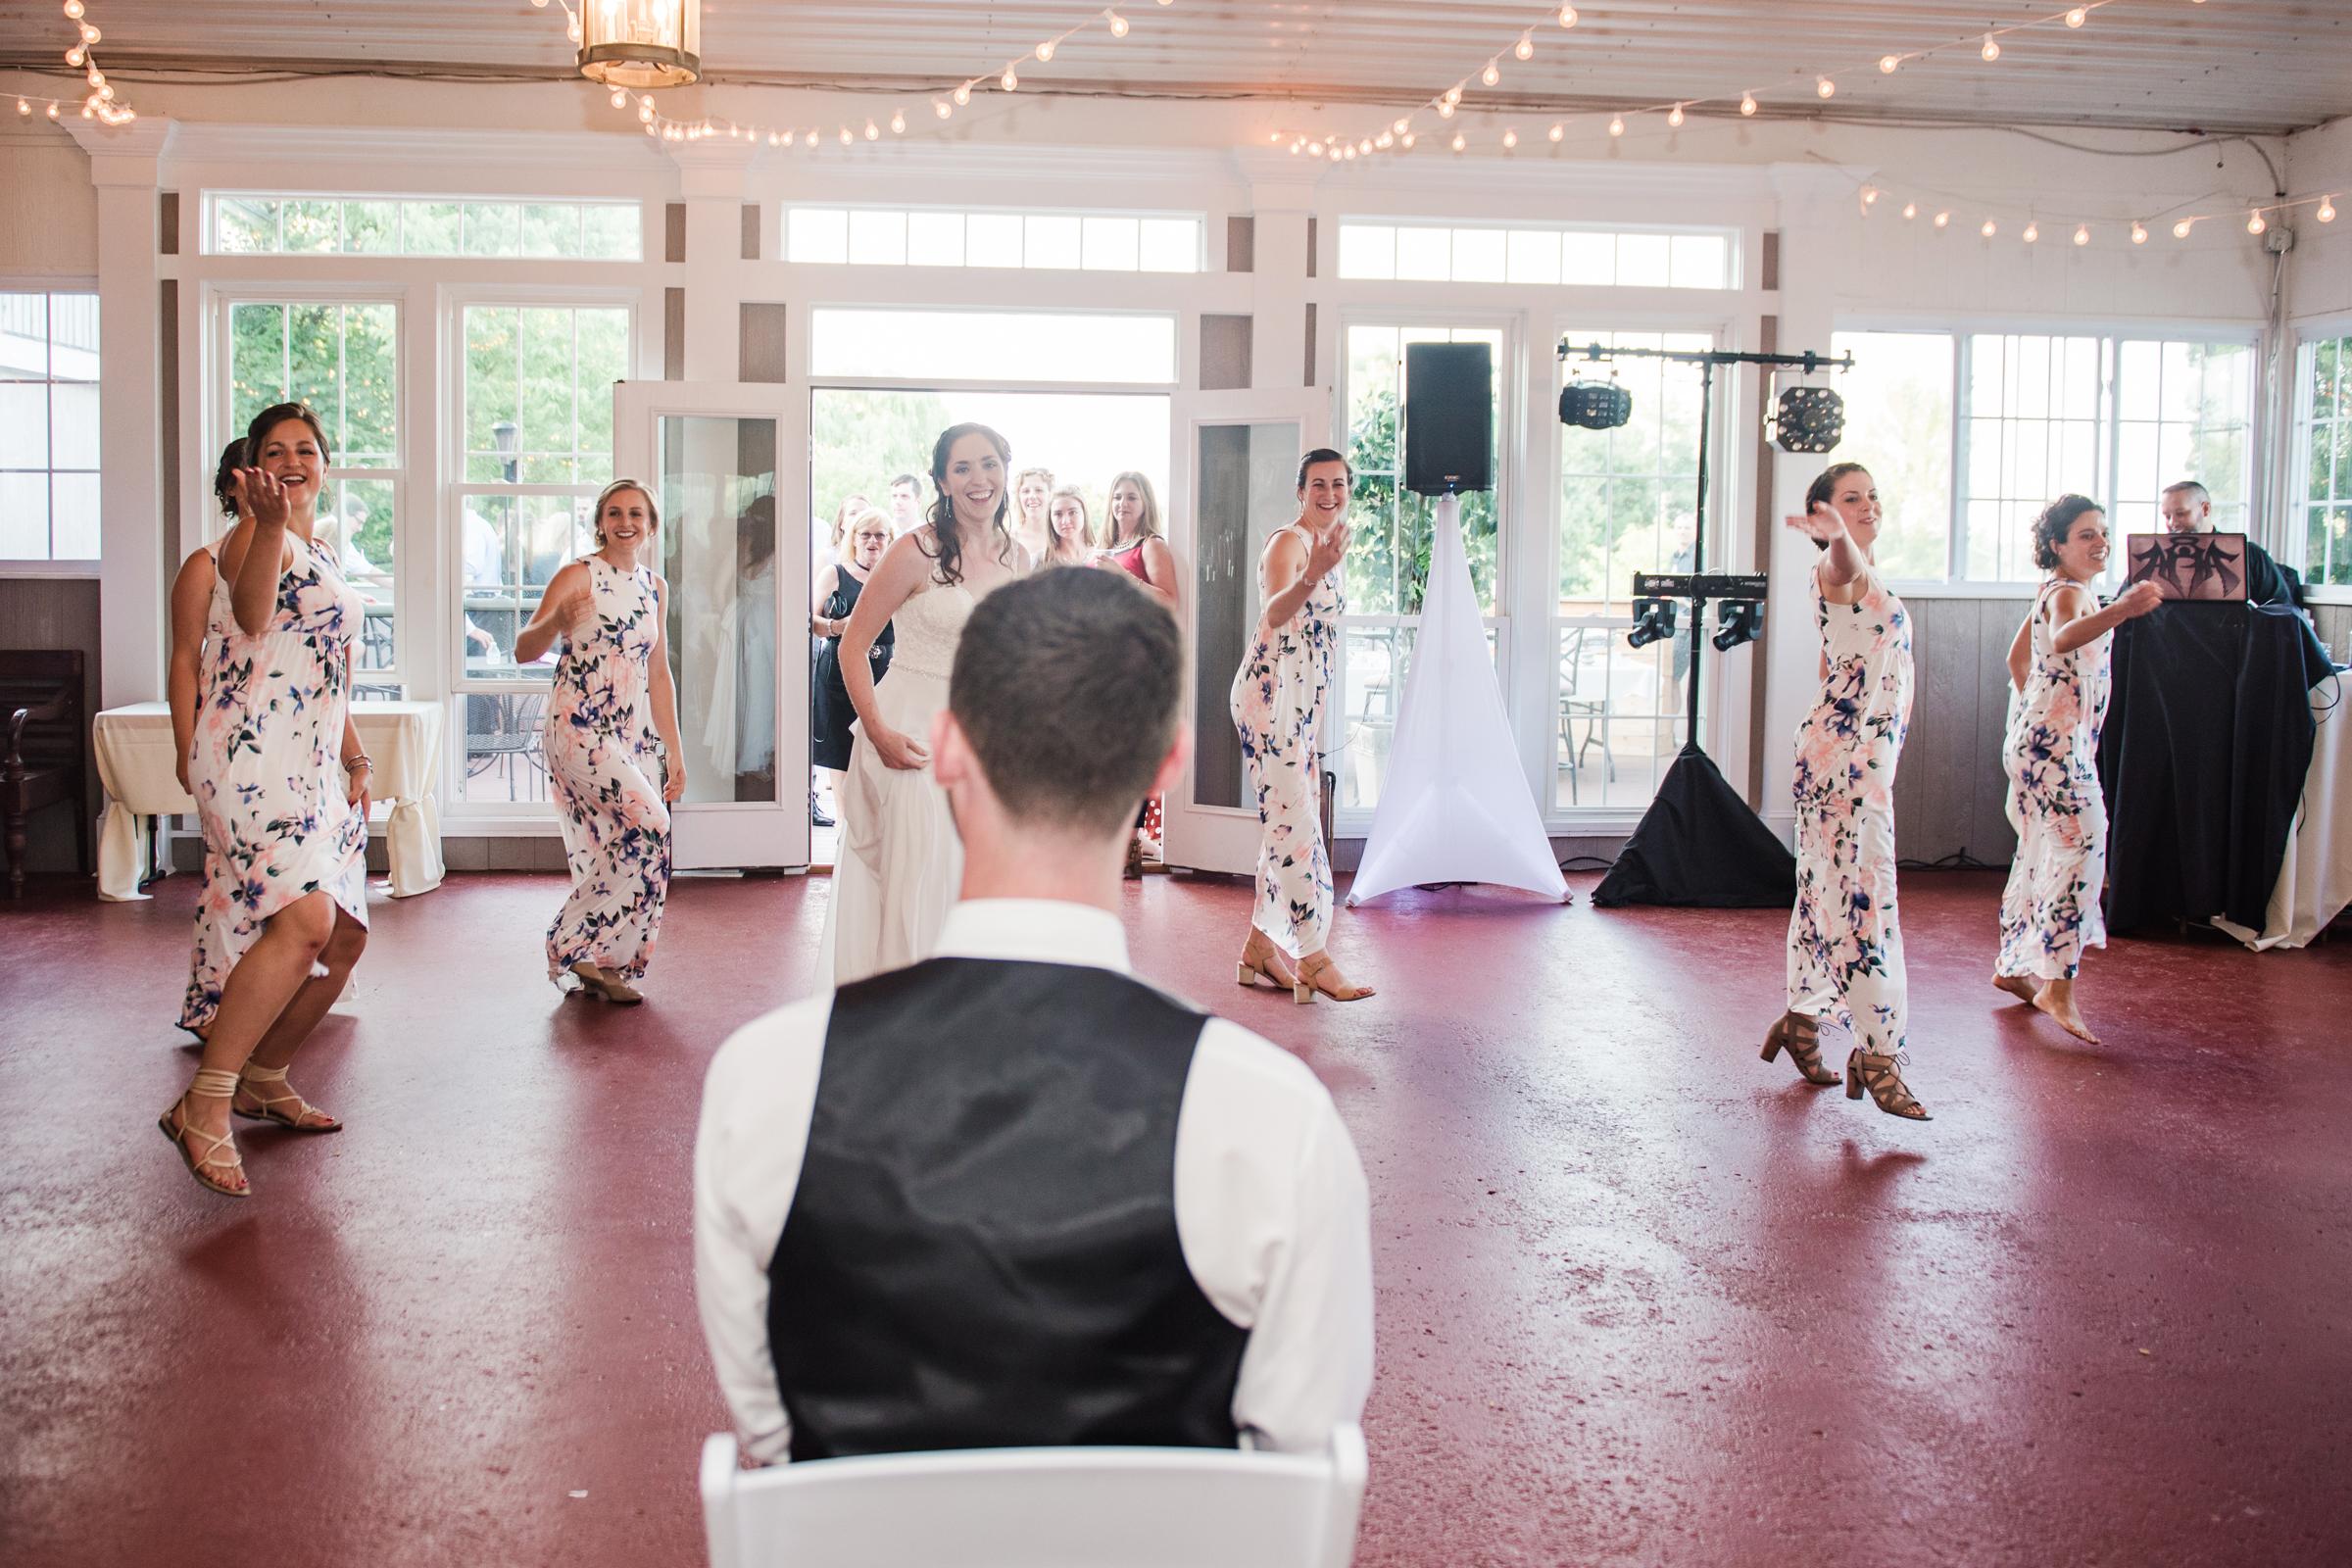 Jerris_Wadsworth_Wedding_Barn_Rochester_Wedding_JILL_STUDIO_Rochester_NY_Photographer_DSC_2924.jpg